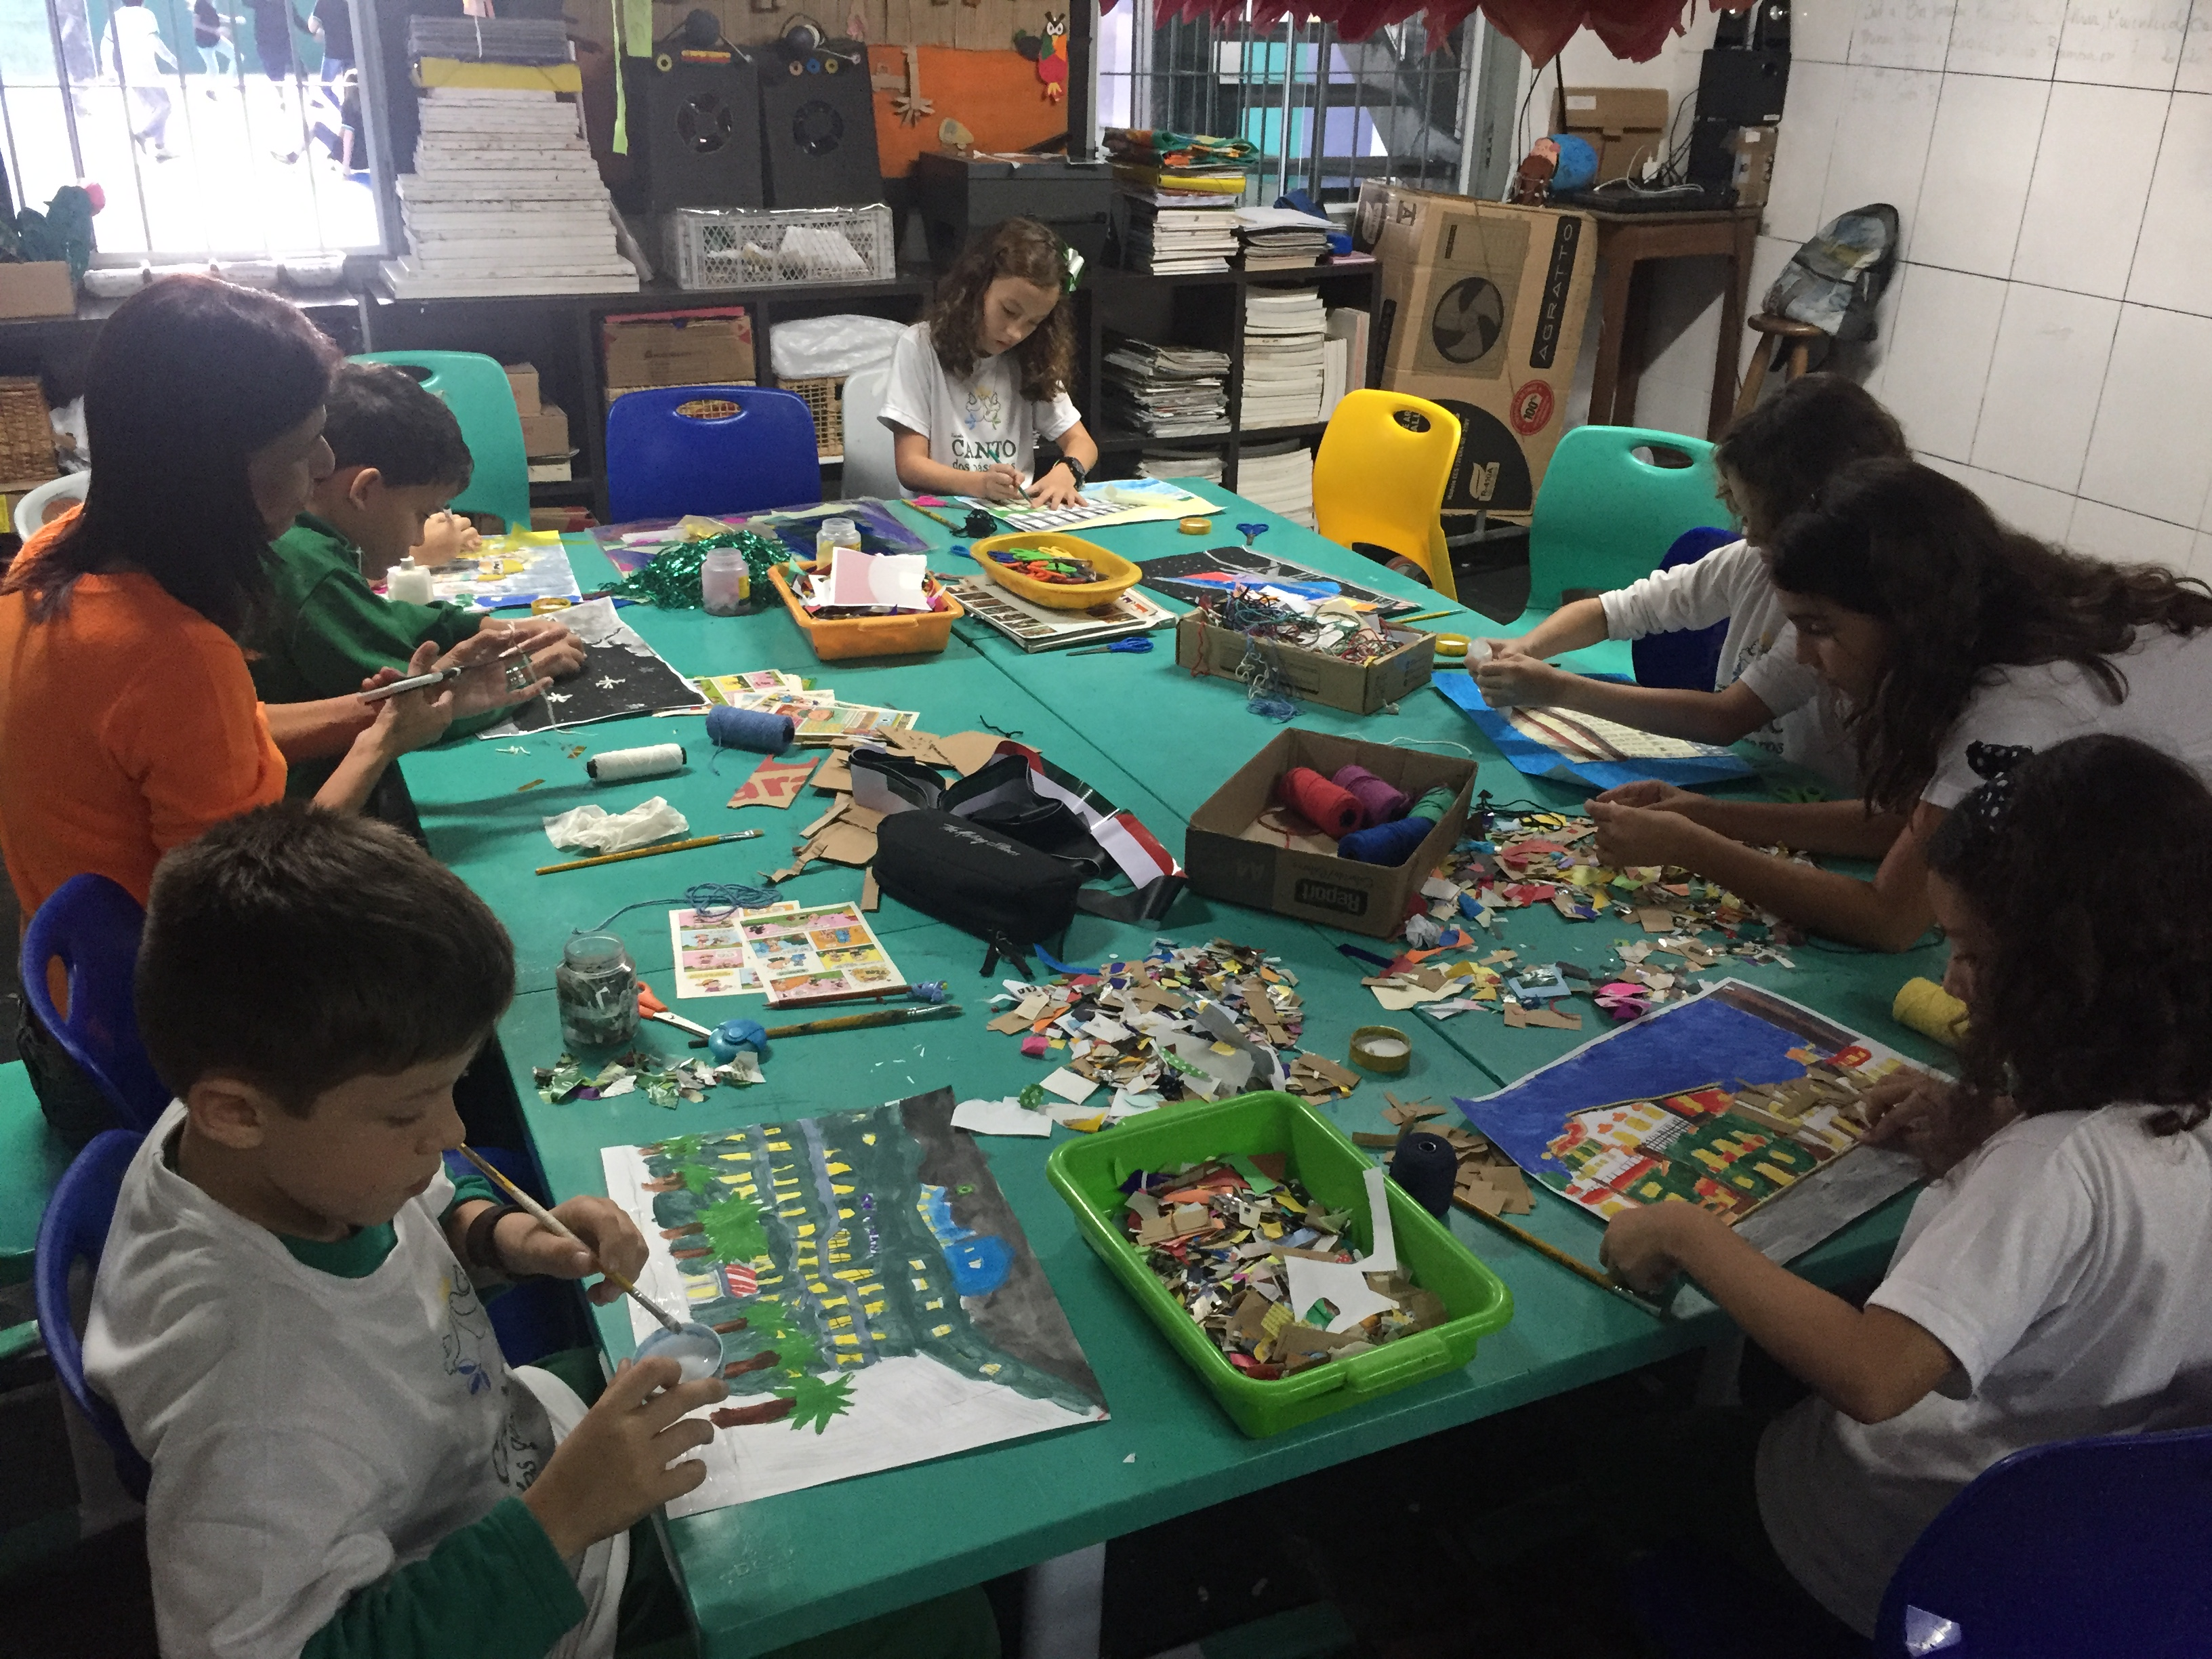 Brazílie - Escola Canto dos Pássaros